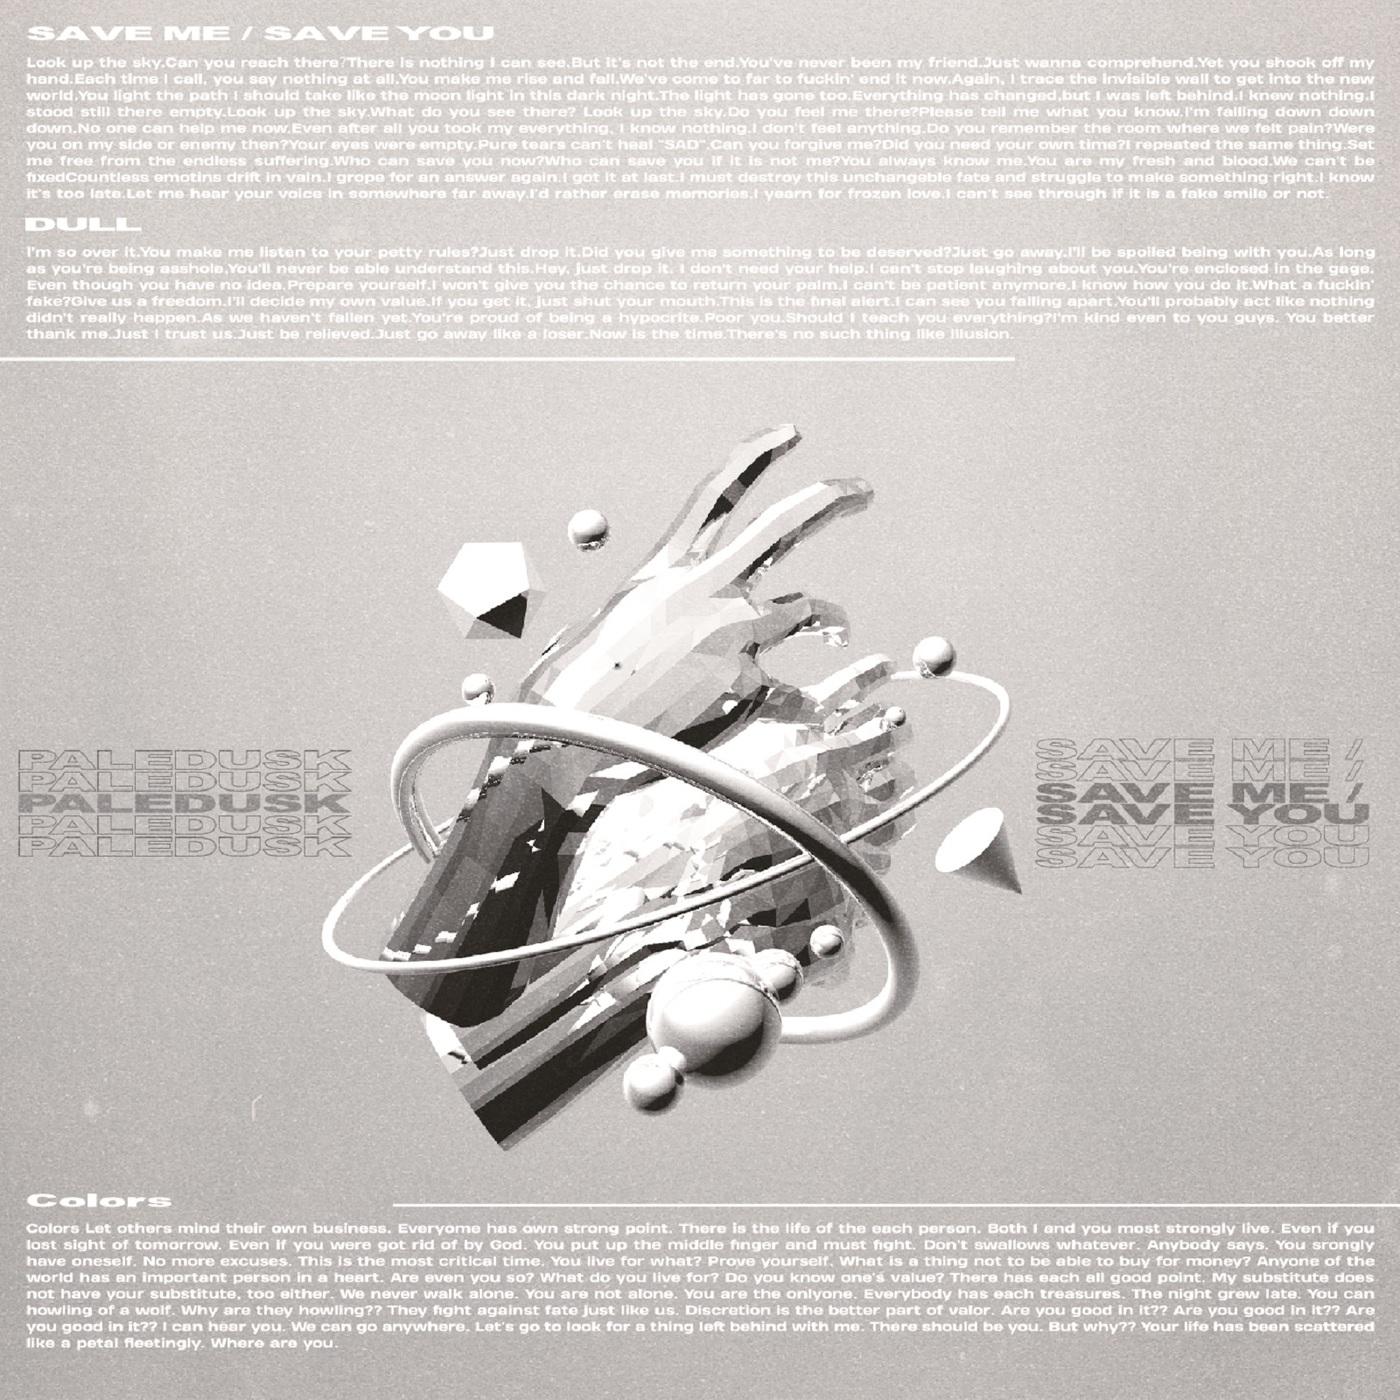 Paledusk - Save Me / Save You [EP] (2018)